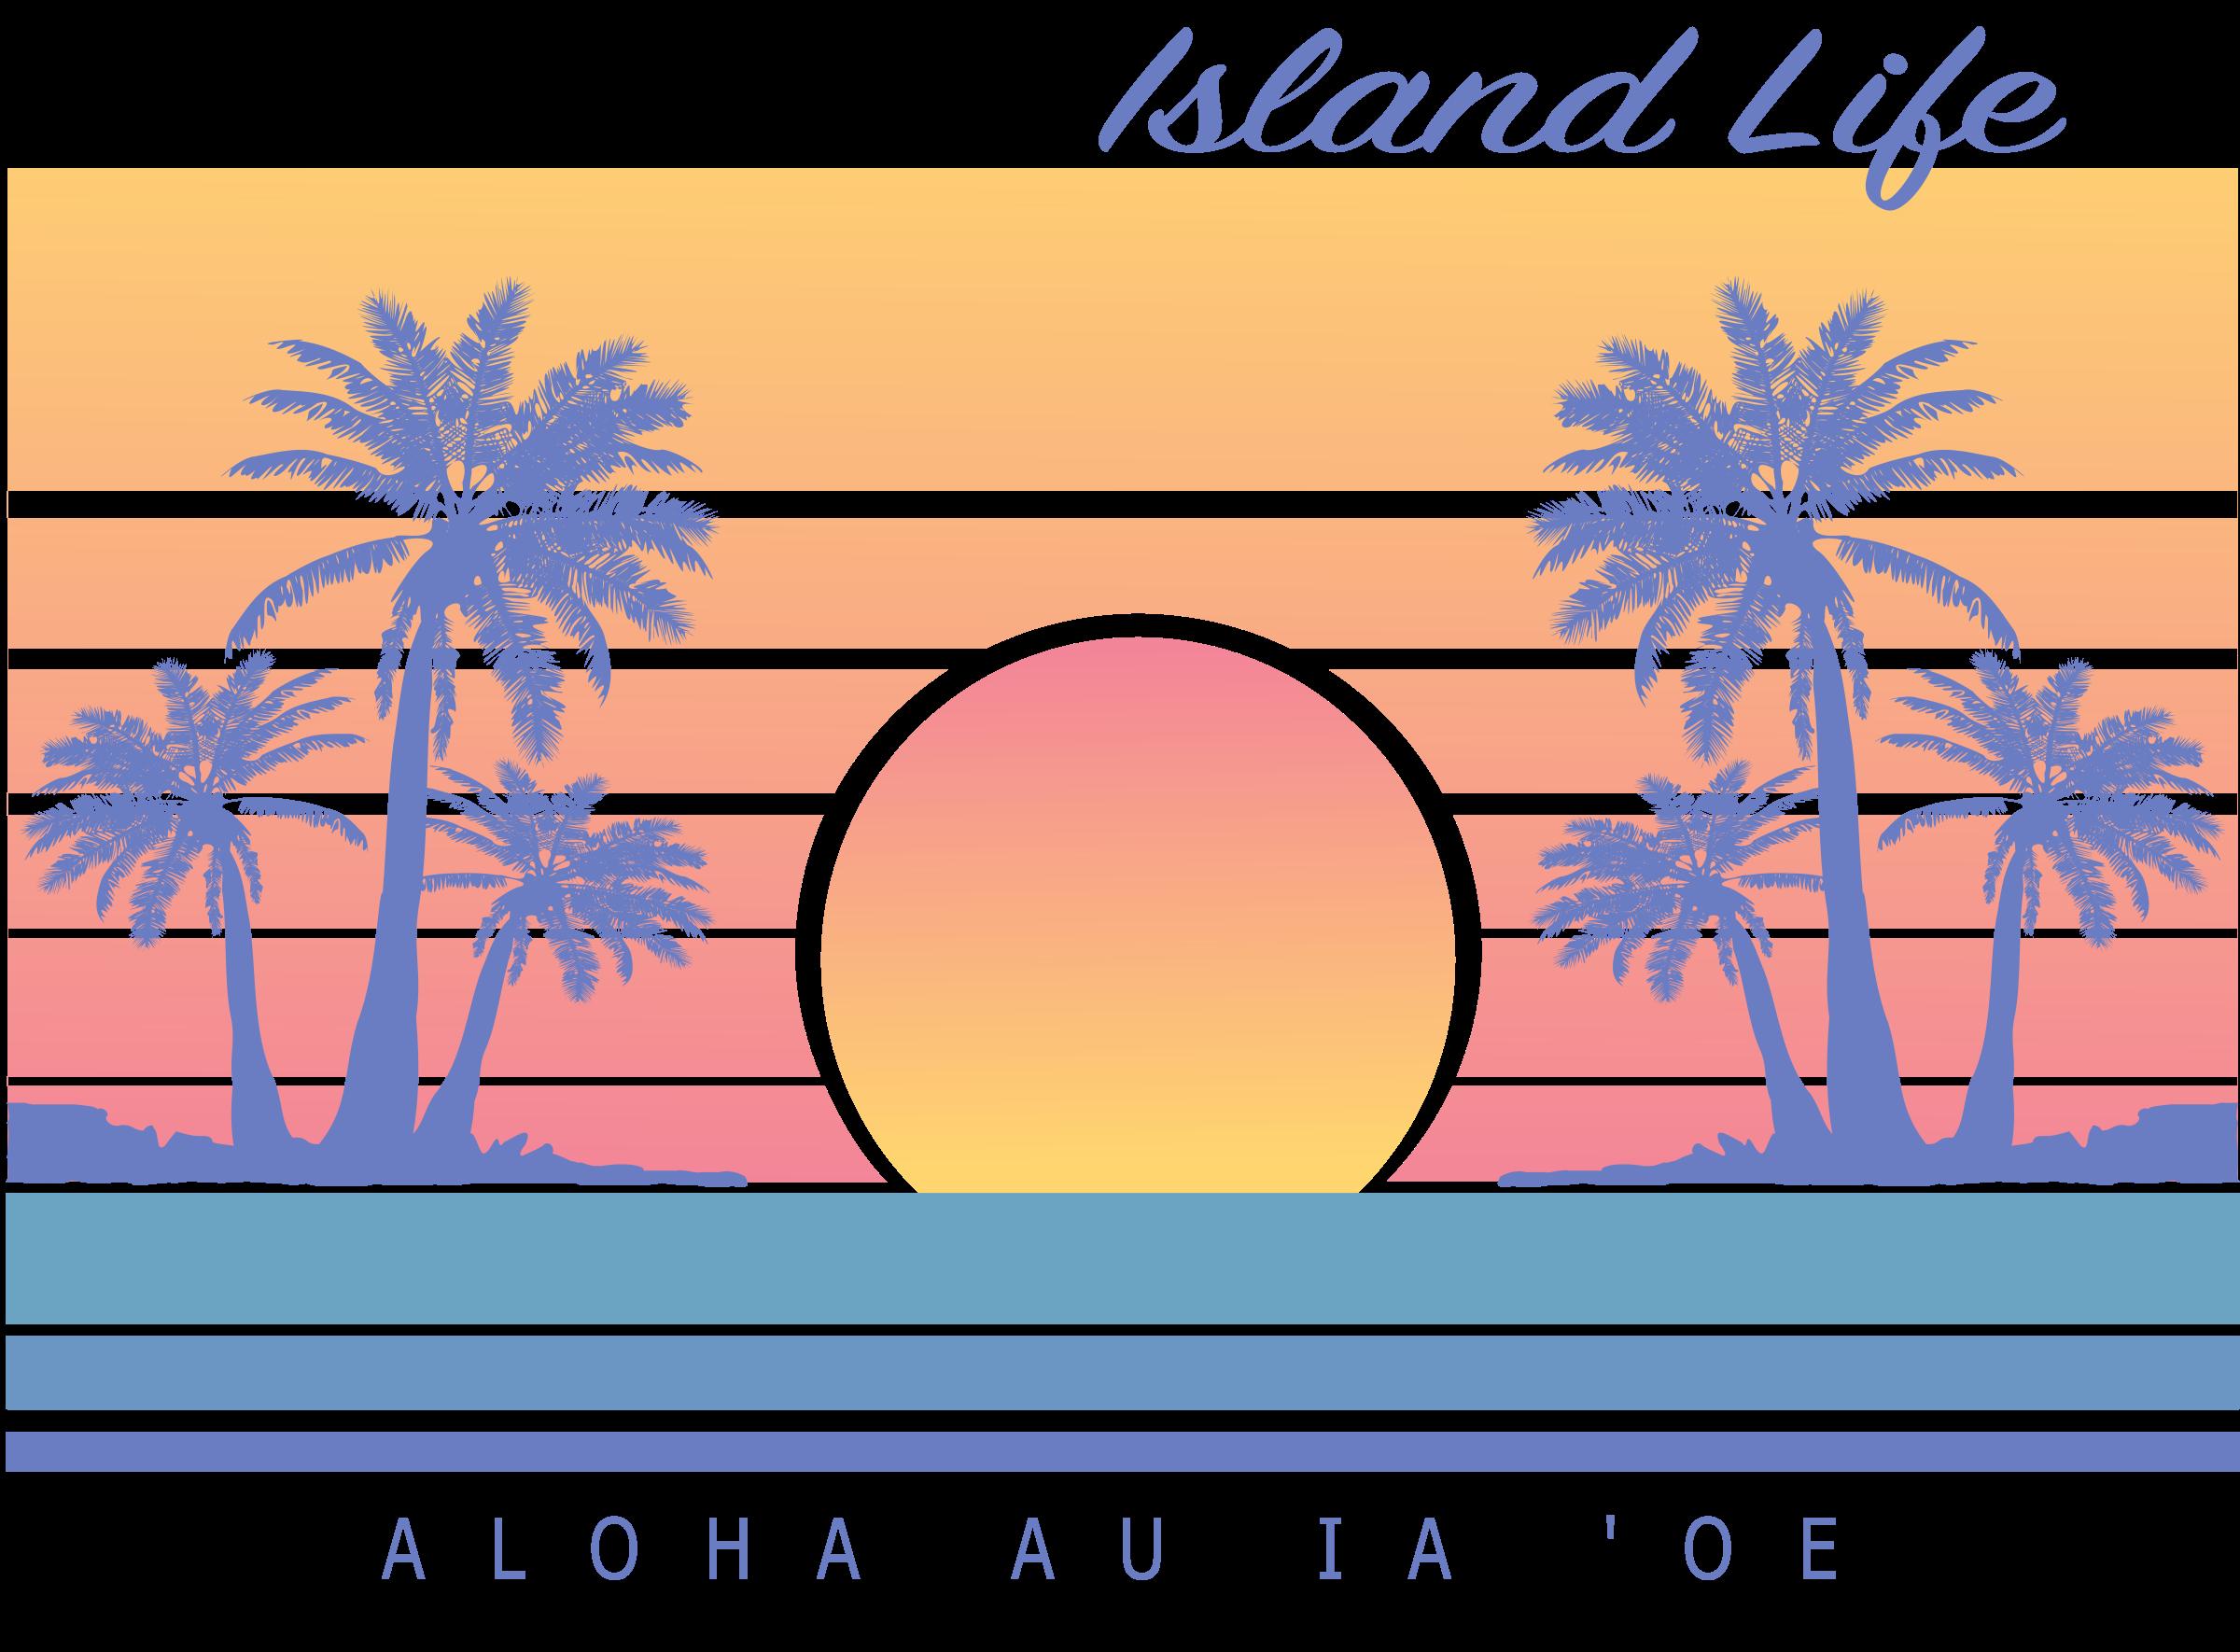 Island island life